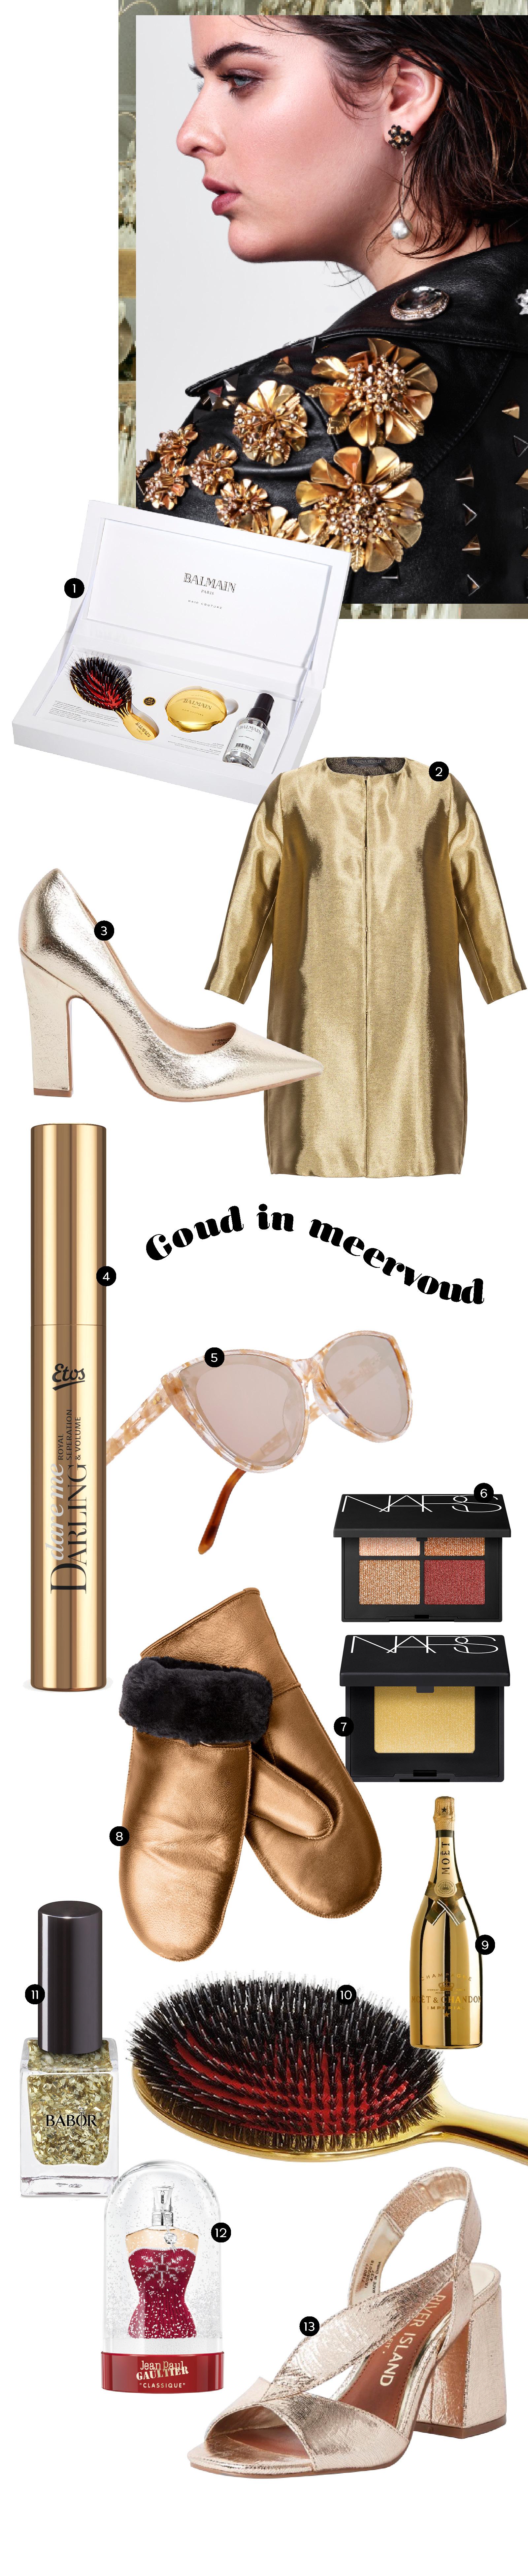 Beautyvol - shopping - goud - glanzend